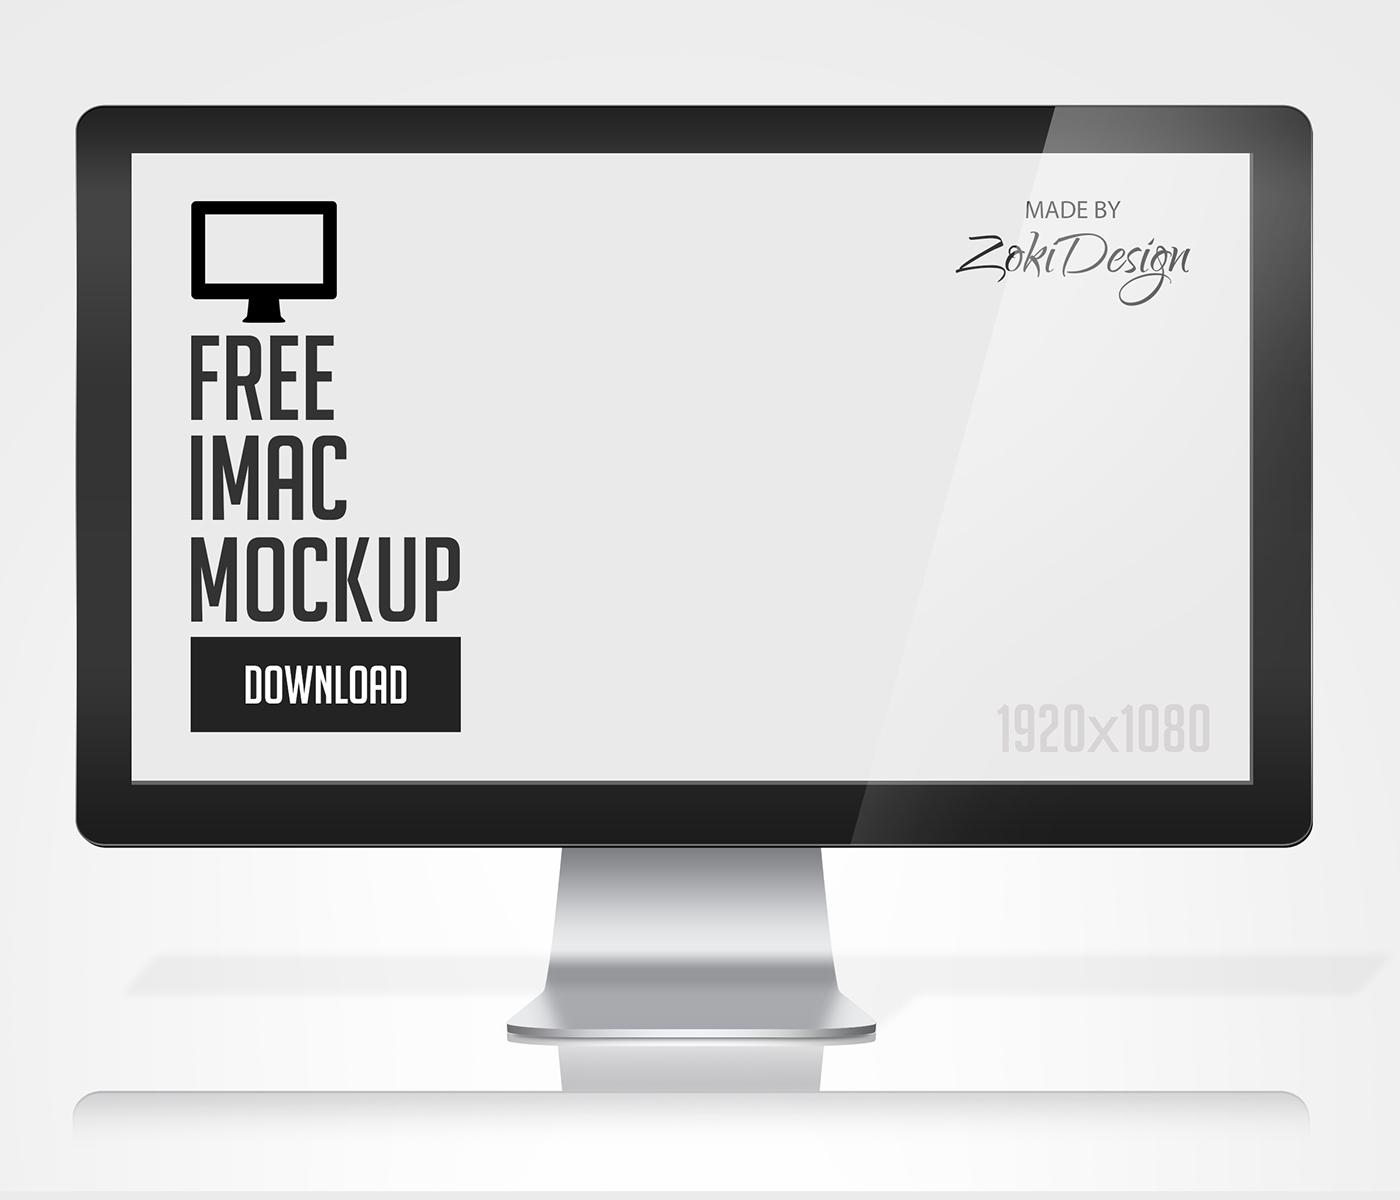 Mockup Free For Mac